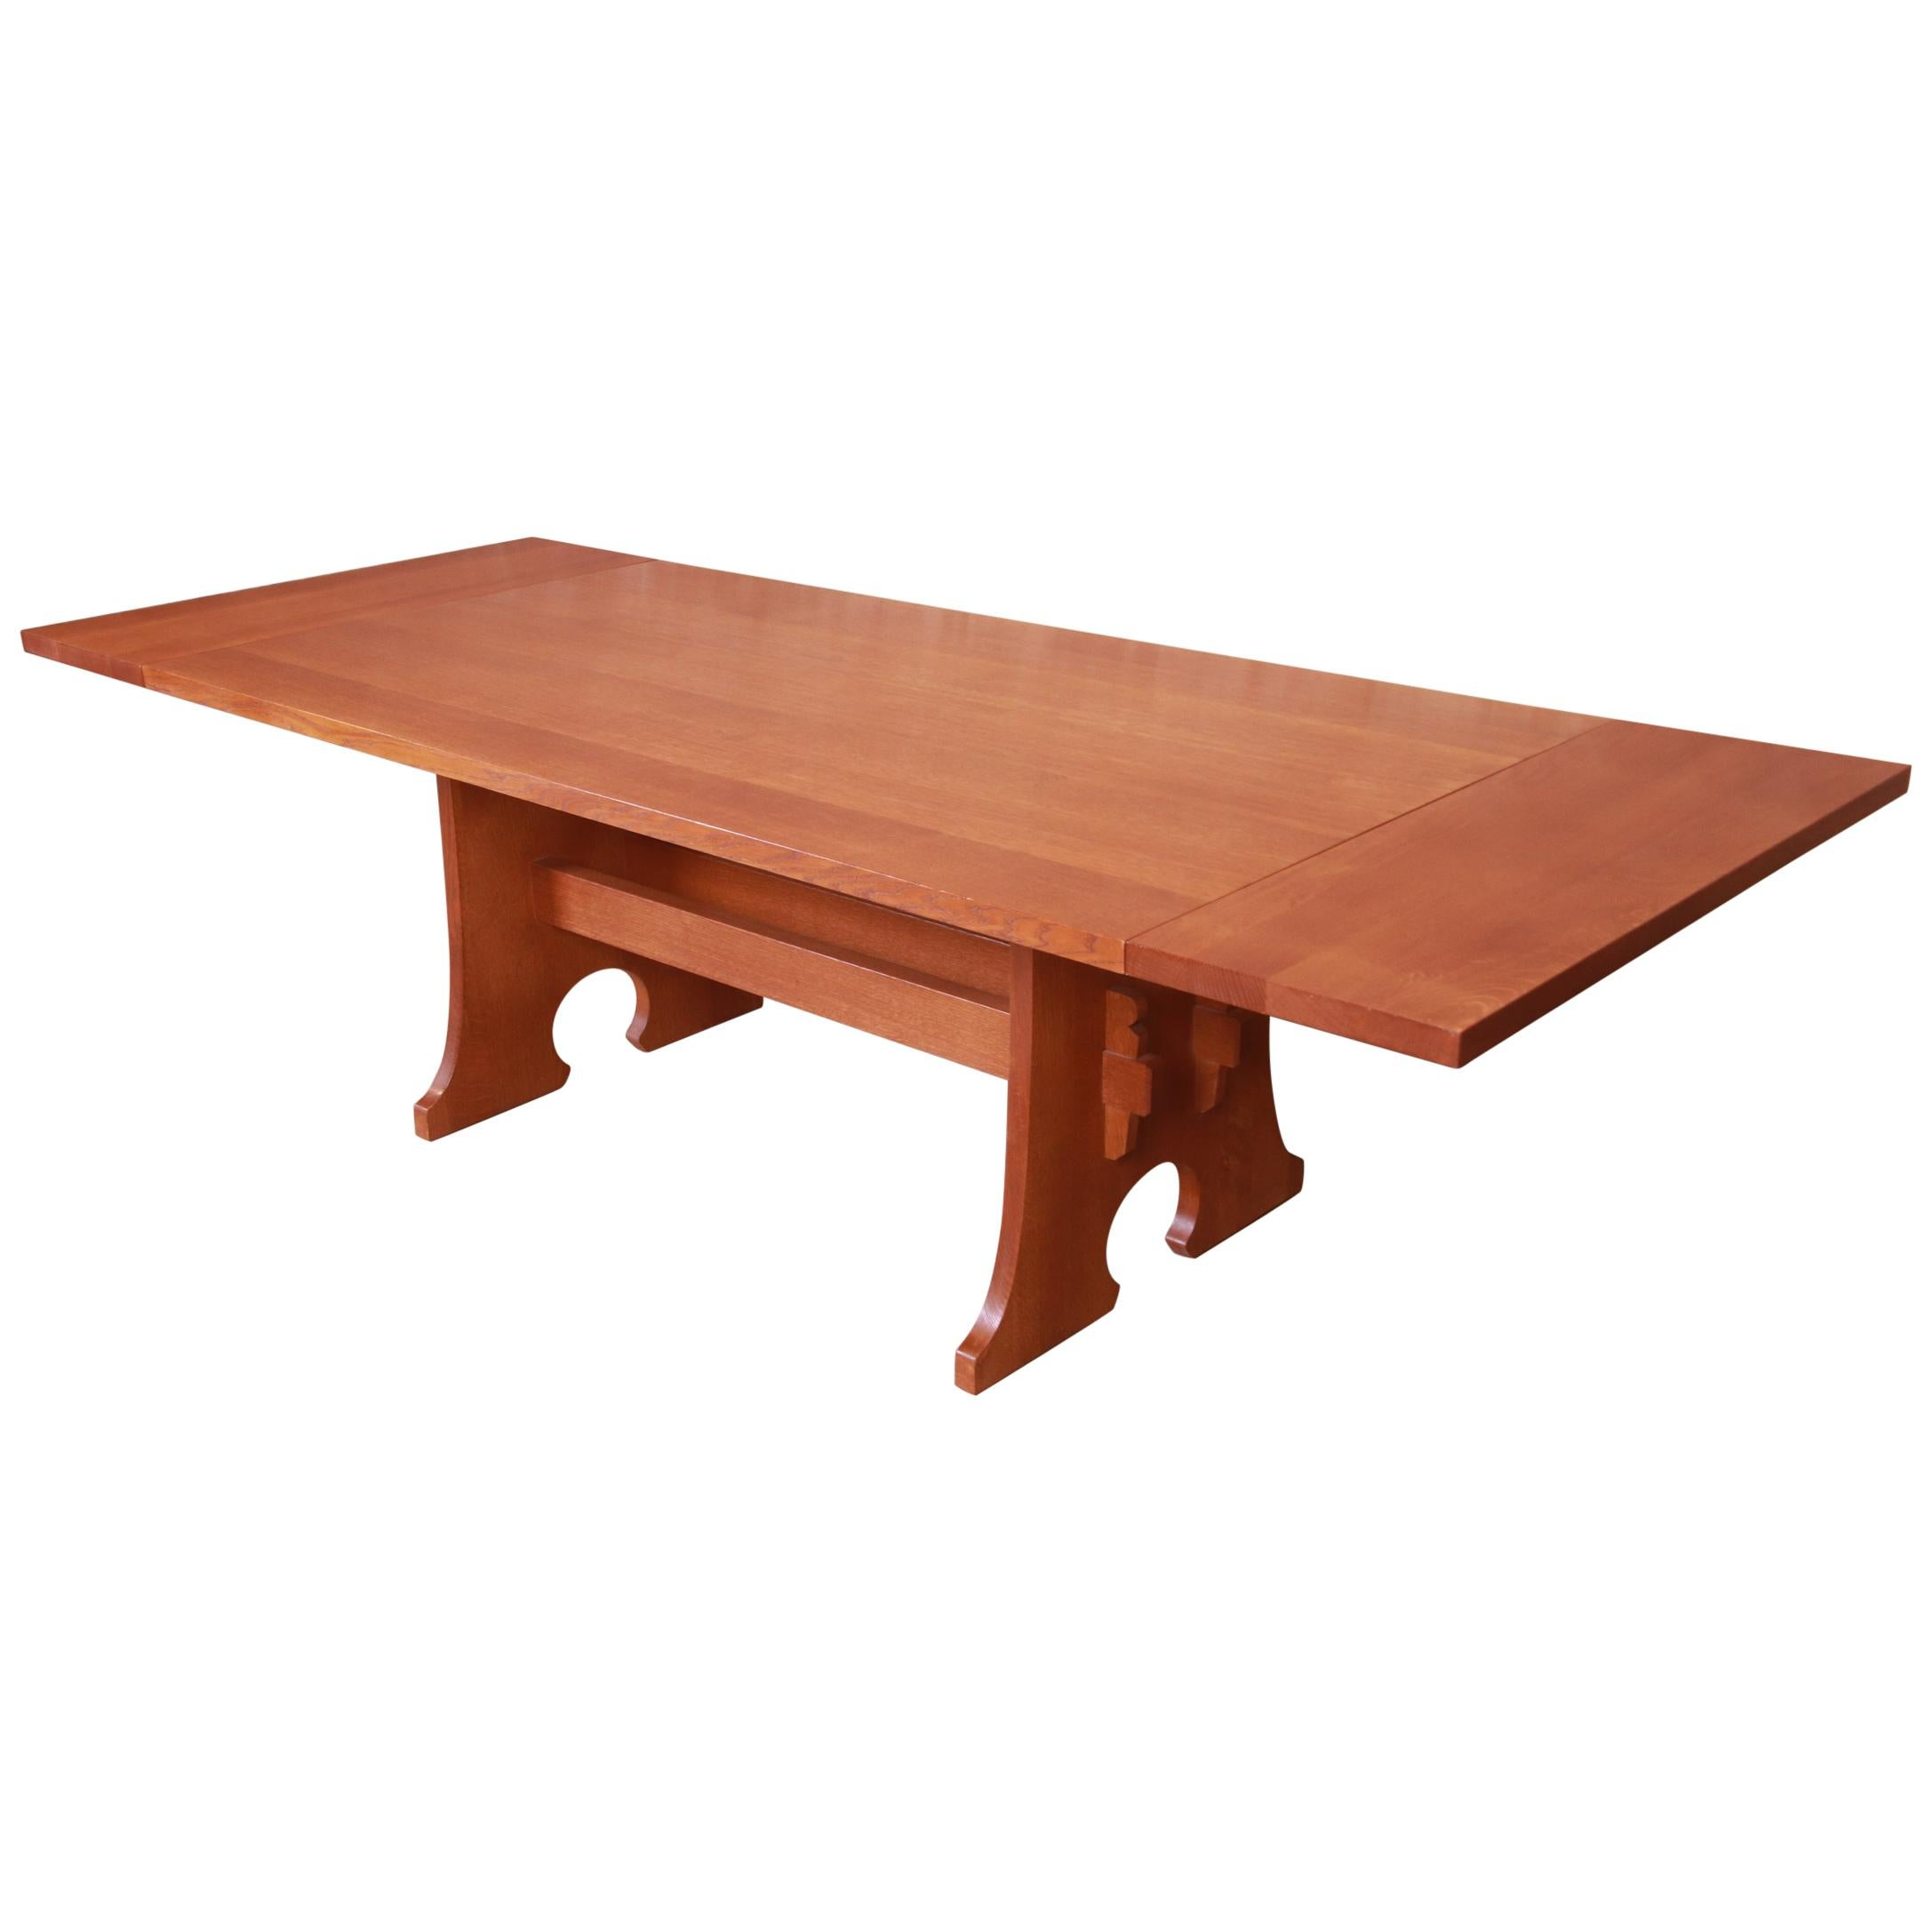 Stickley Arts & Crafts Solid Oak Trestle Base Extension Dining Table